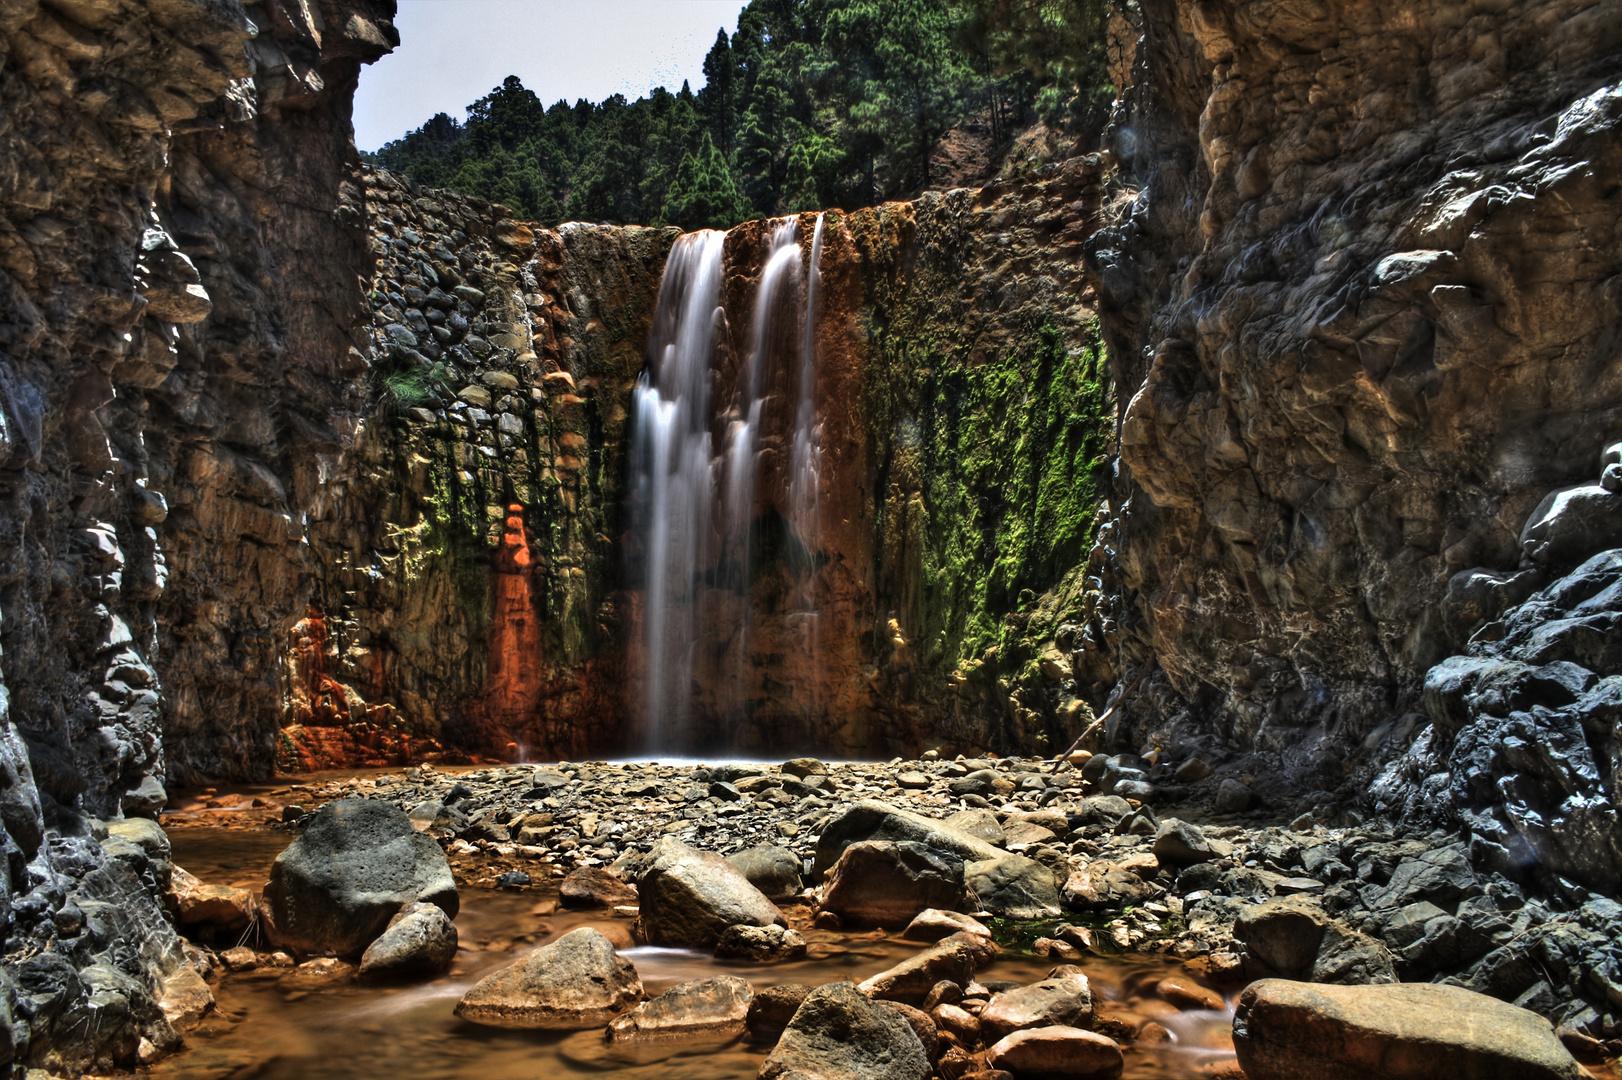 Wasserfall / Cascada de Colores, La Palma HDR